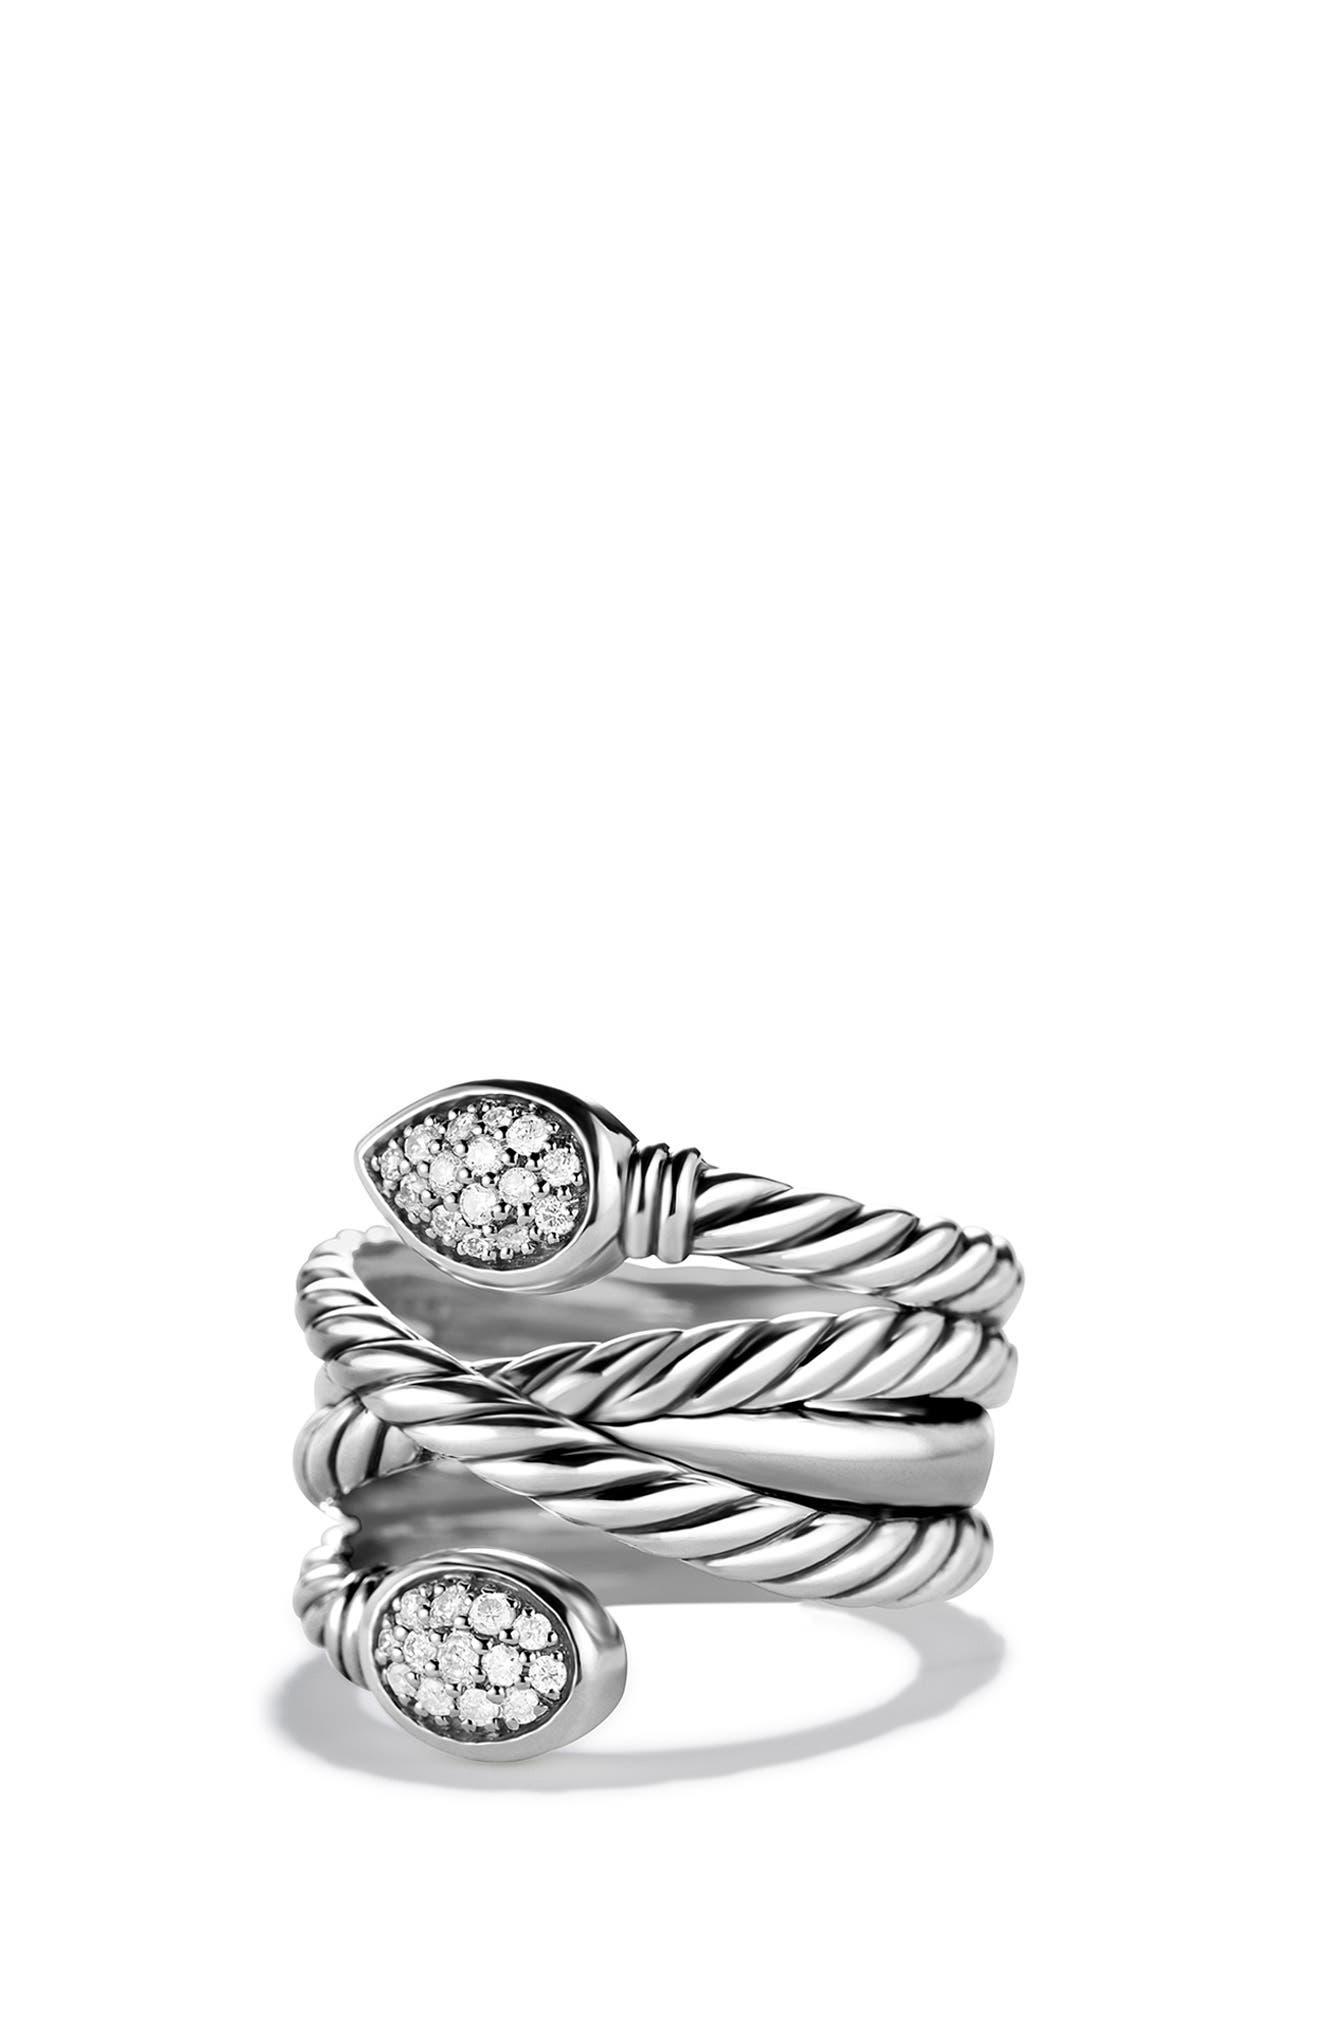 'Renaissance' Ring with Diamonds,                             Alternate thumbnail 5, color,                             040